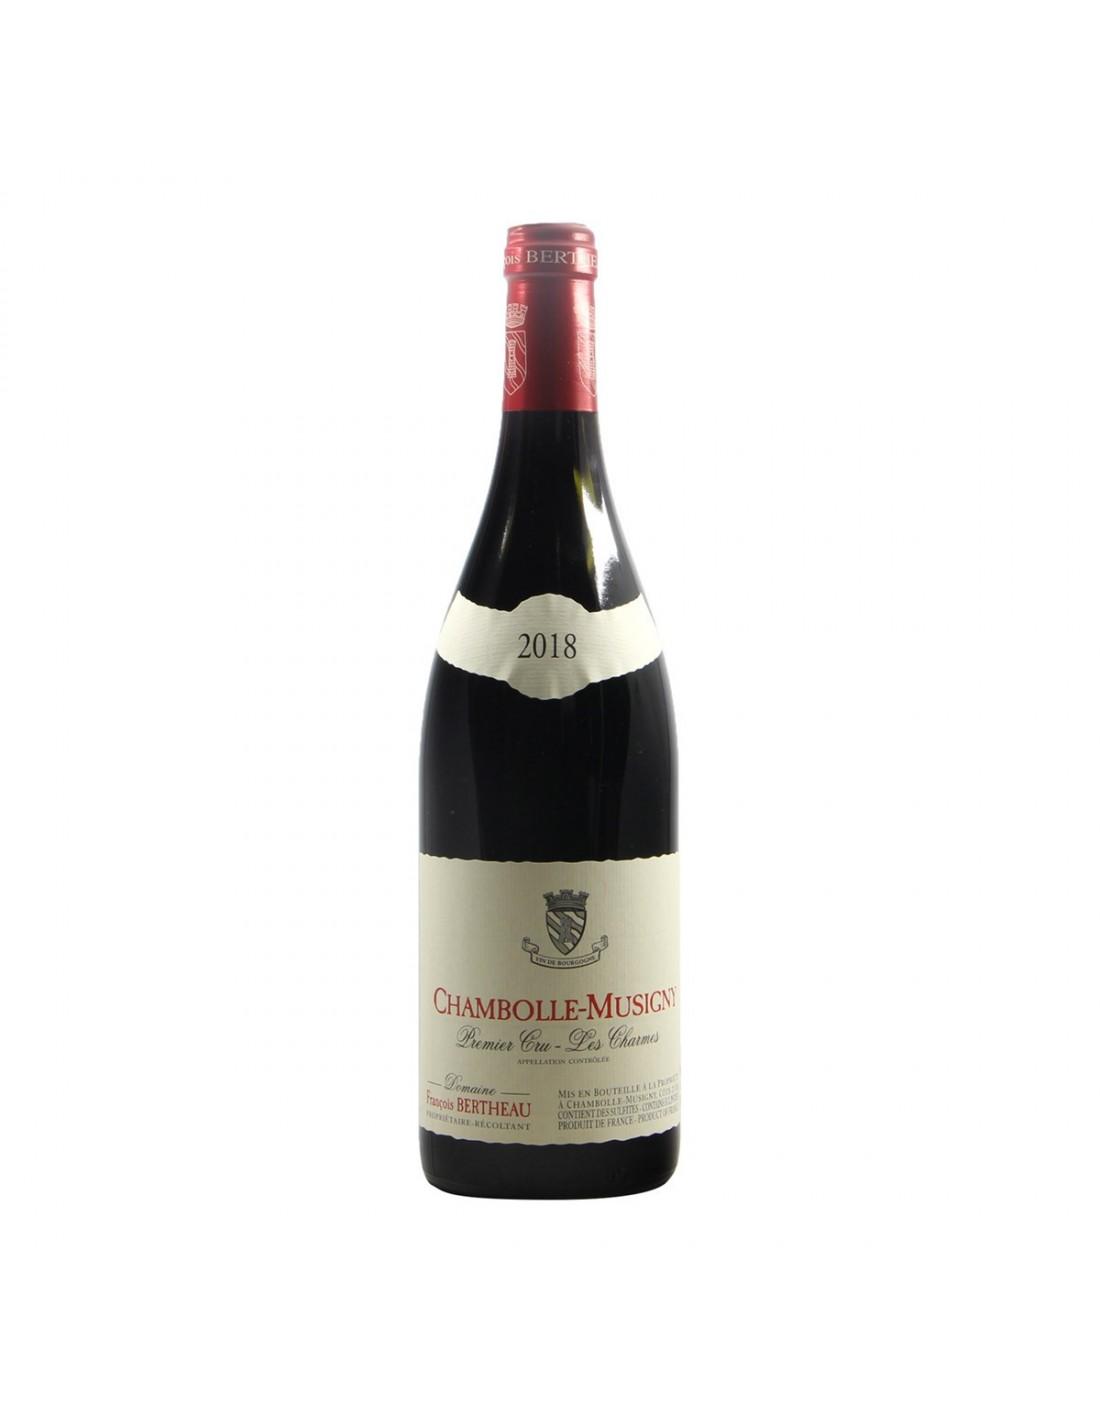 CHAMBOLLE MUSIGNY 1ER CRU LES CHARMES 2018 FRANCOIS BERTHEAU Grandi Bottiglie